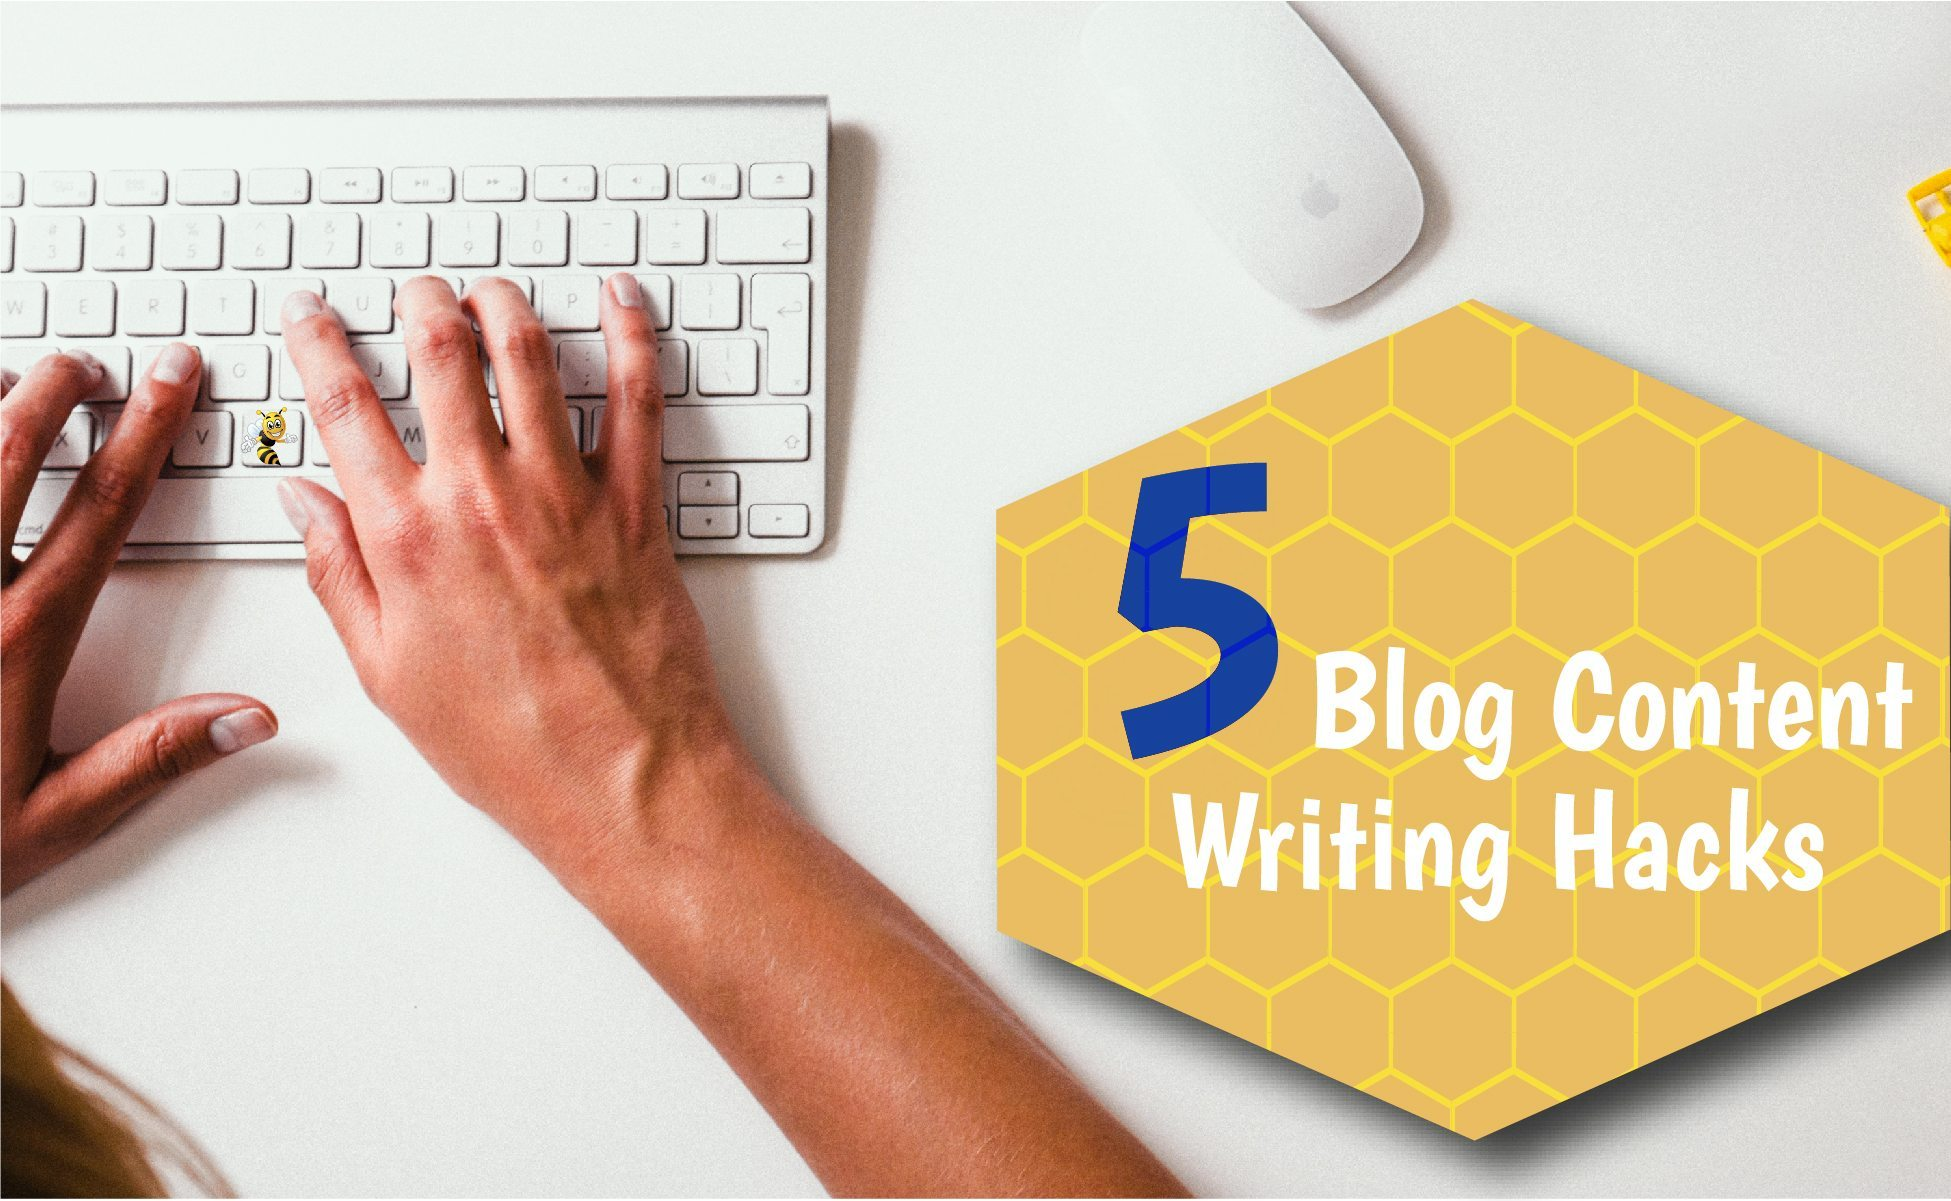 5 Blog Content Writing Hacks